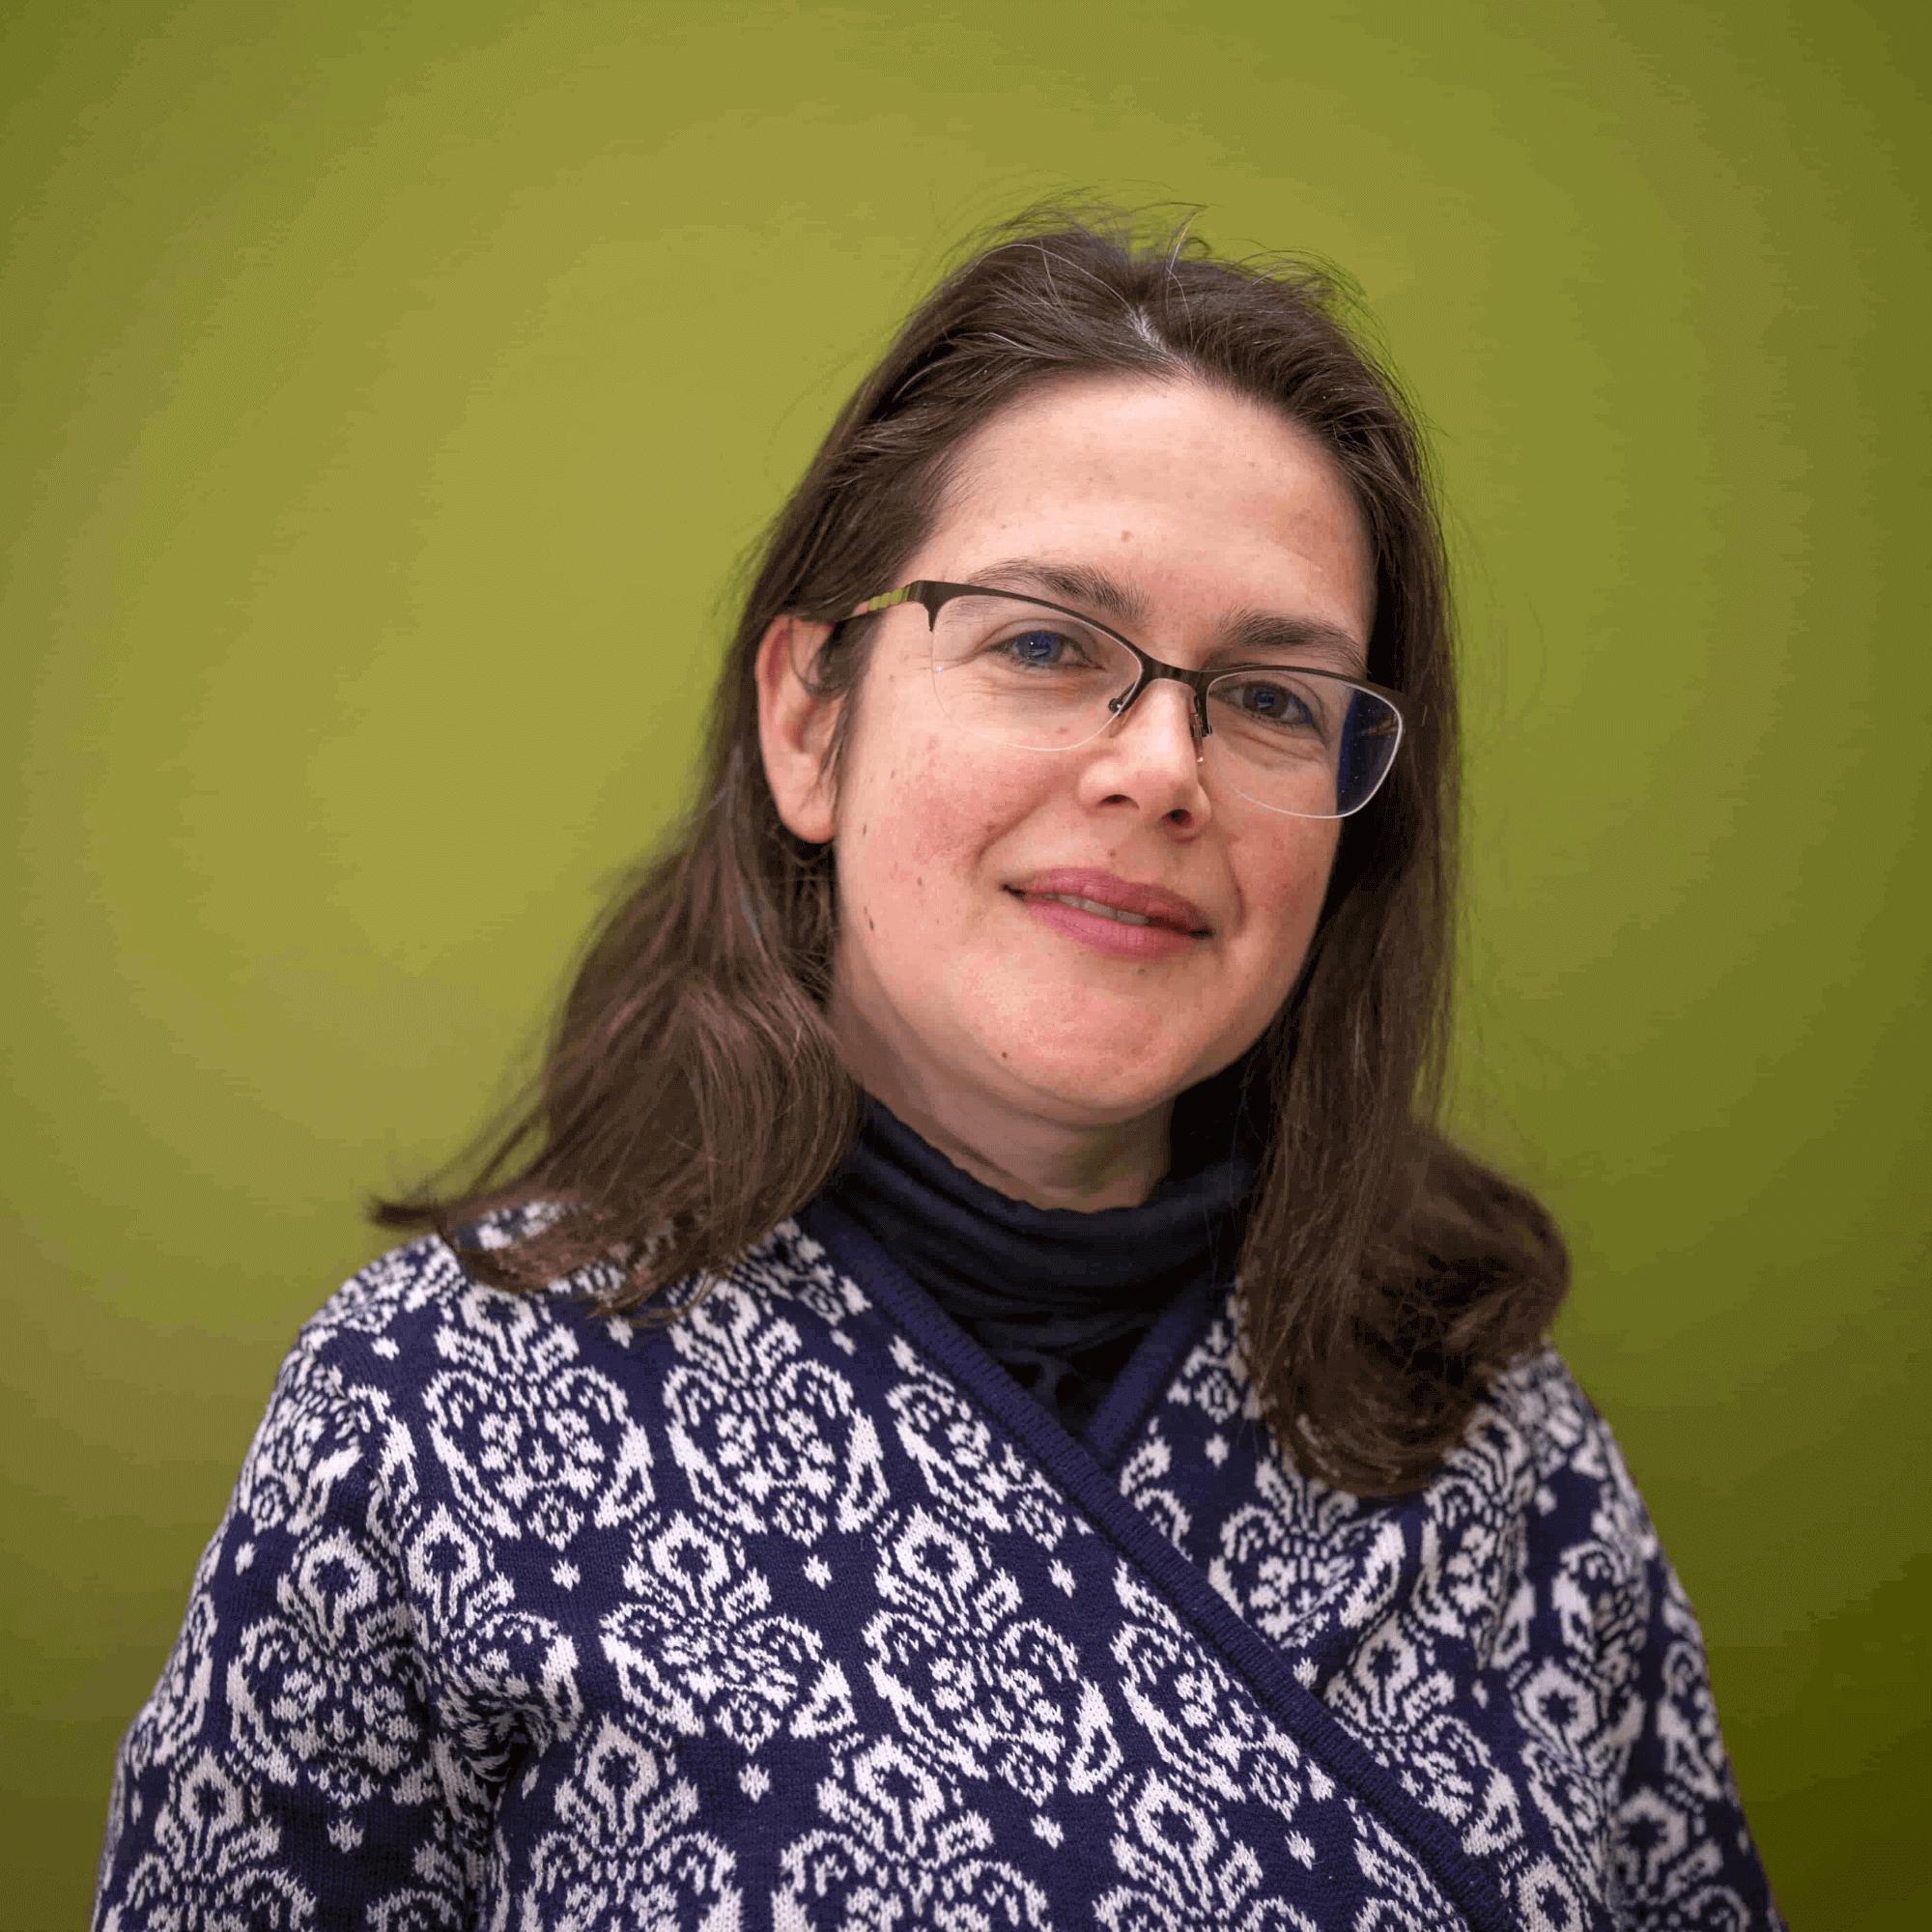 Audrey Lebioda - La Suède en kit